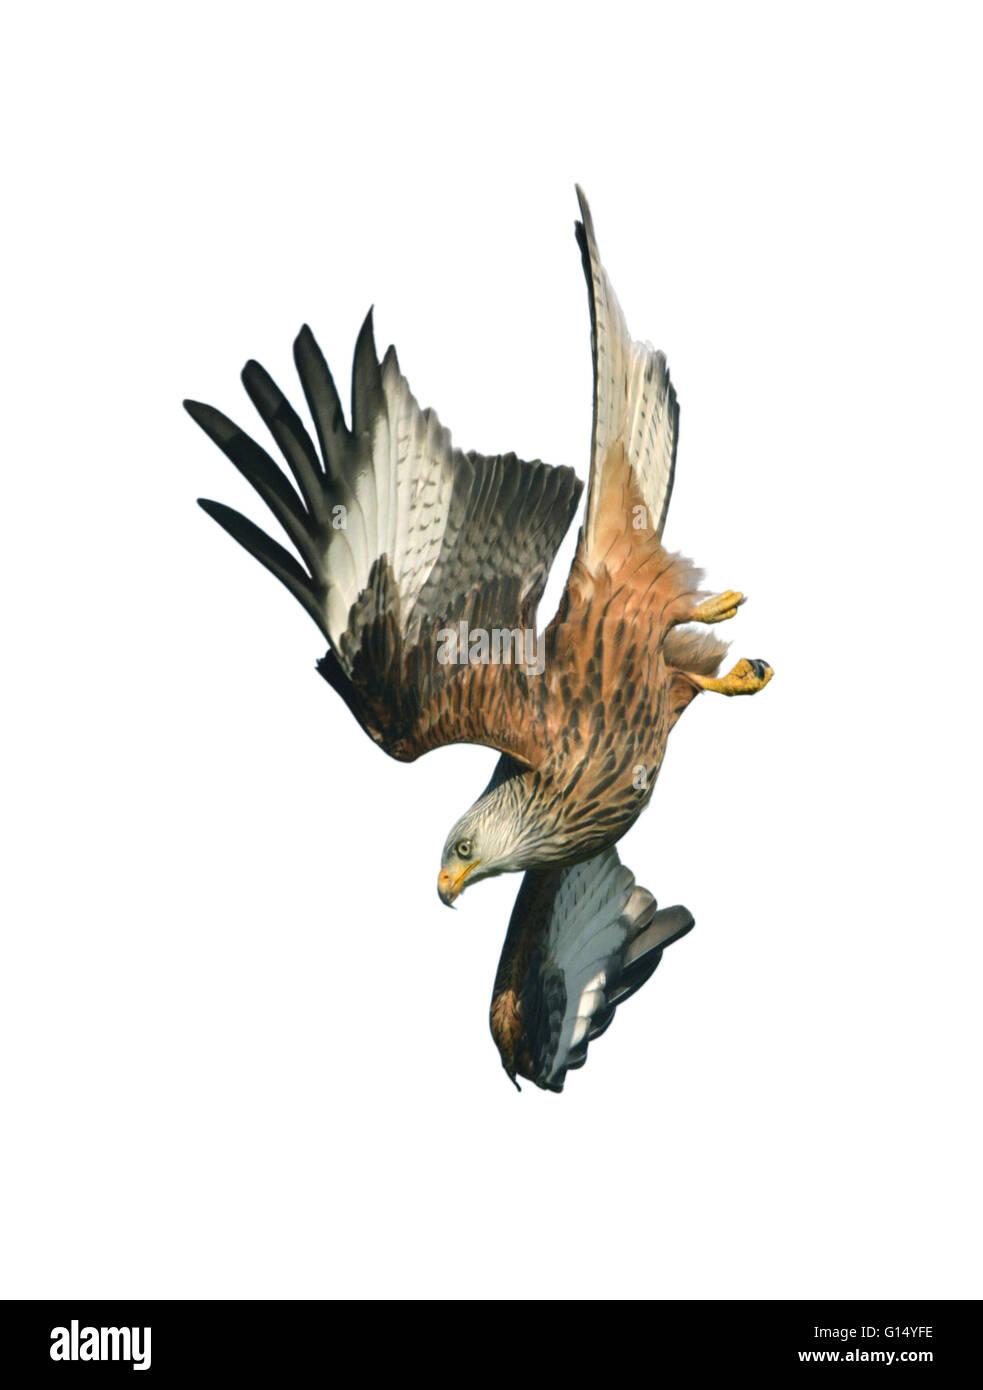 Red Kite - Milvus milvus - Stock Image